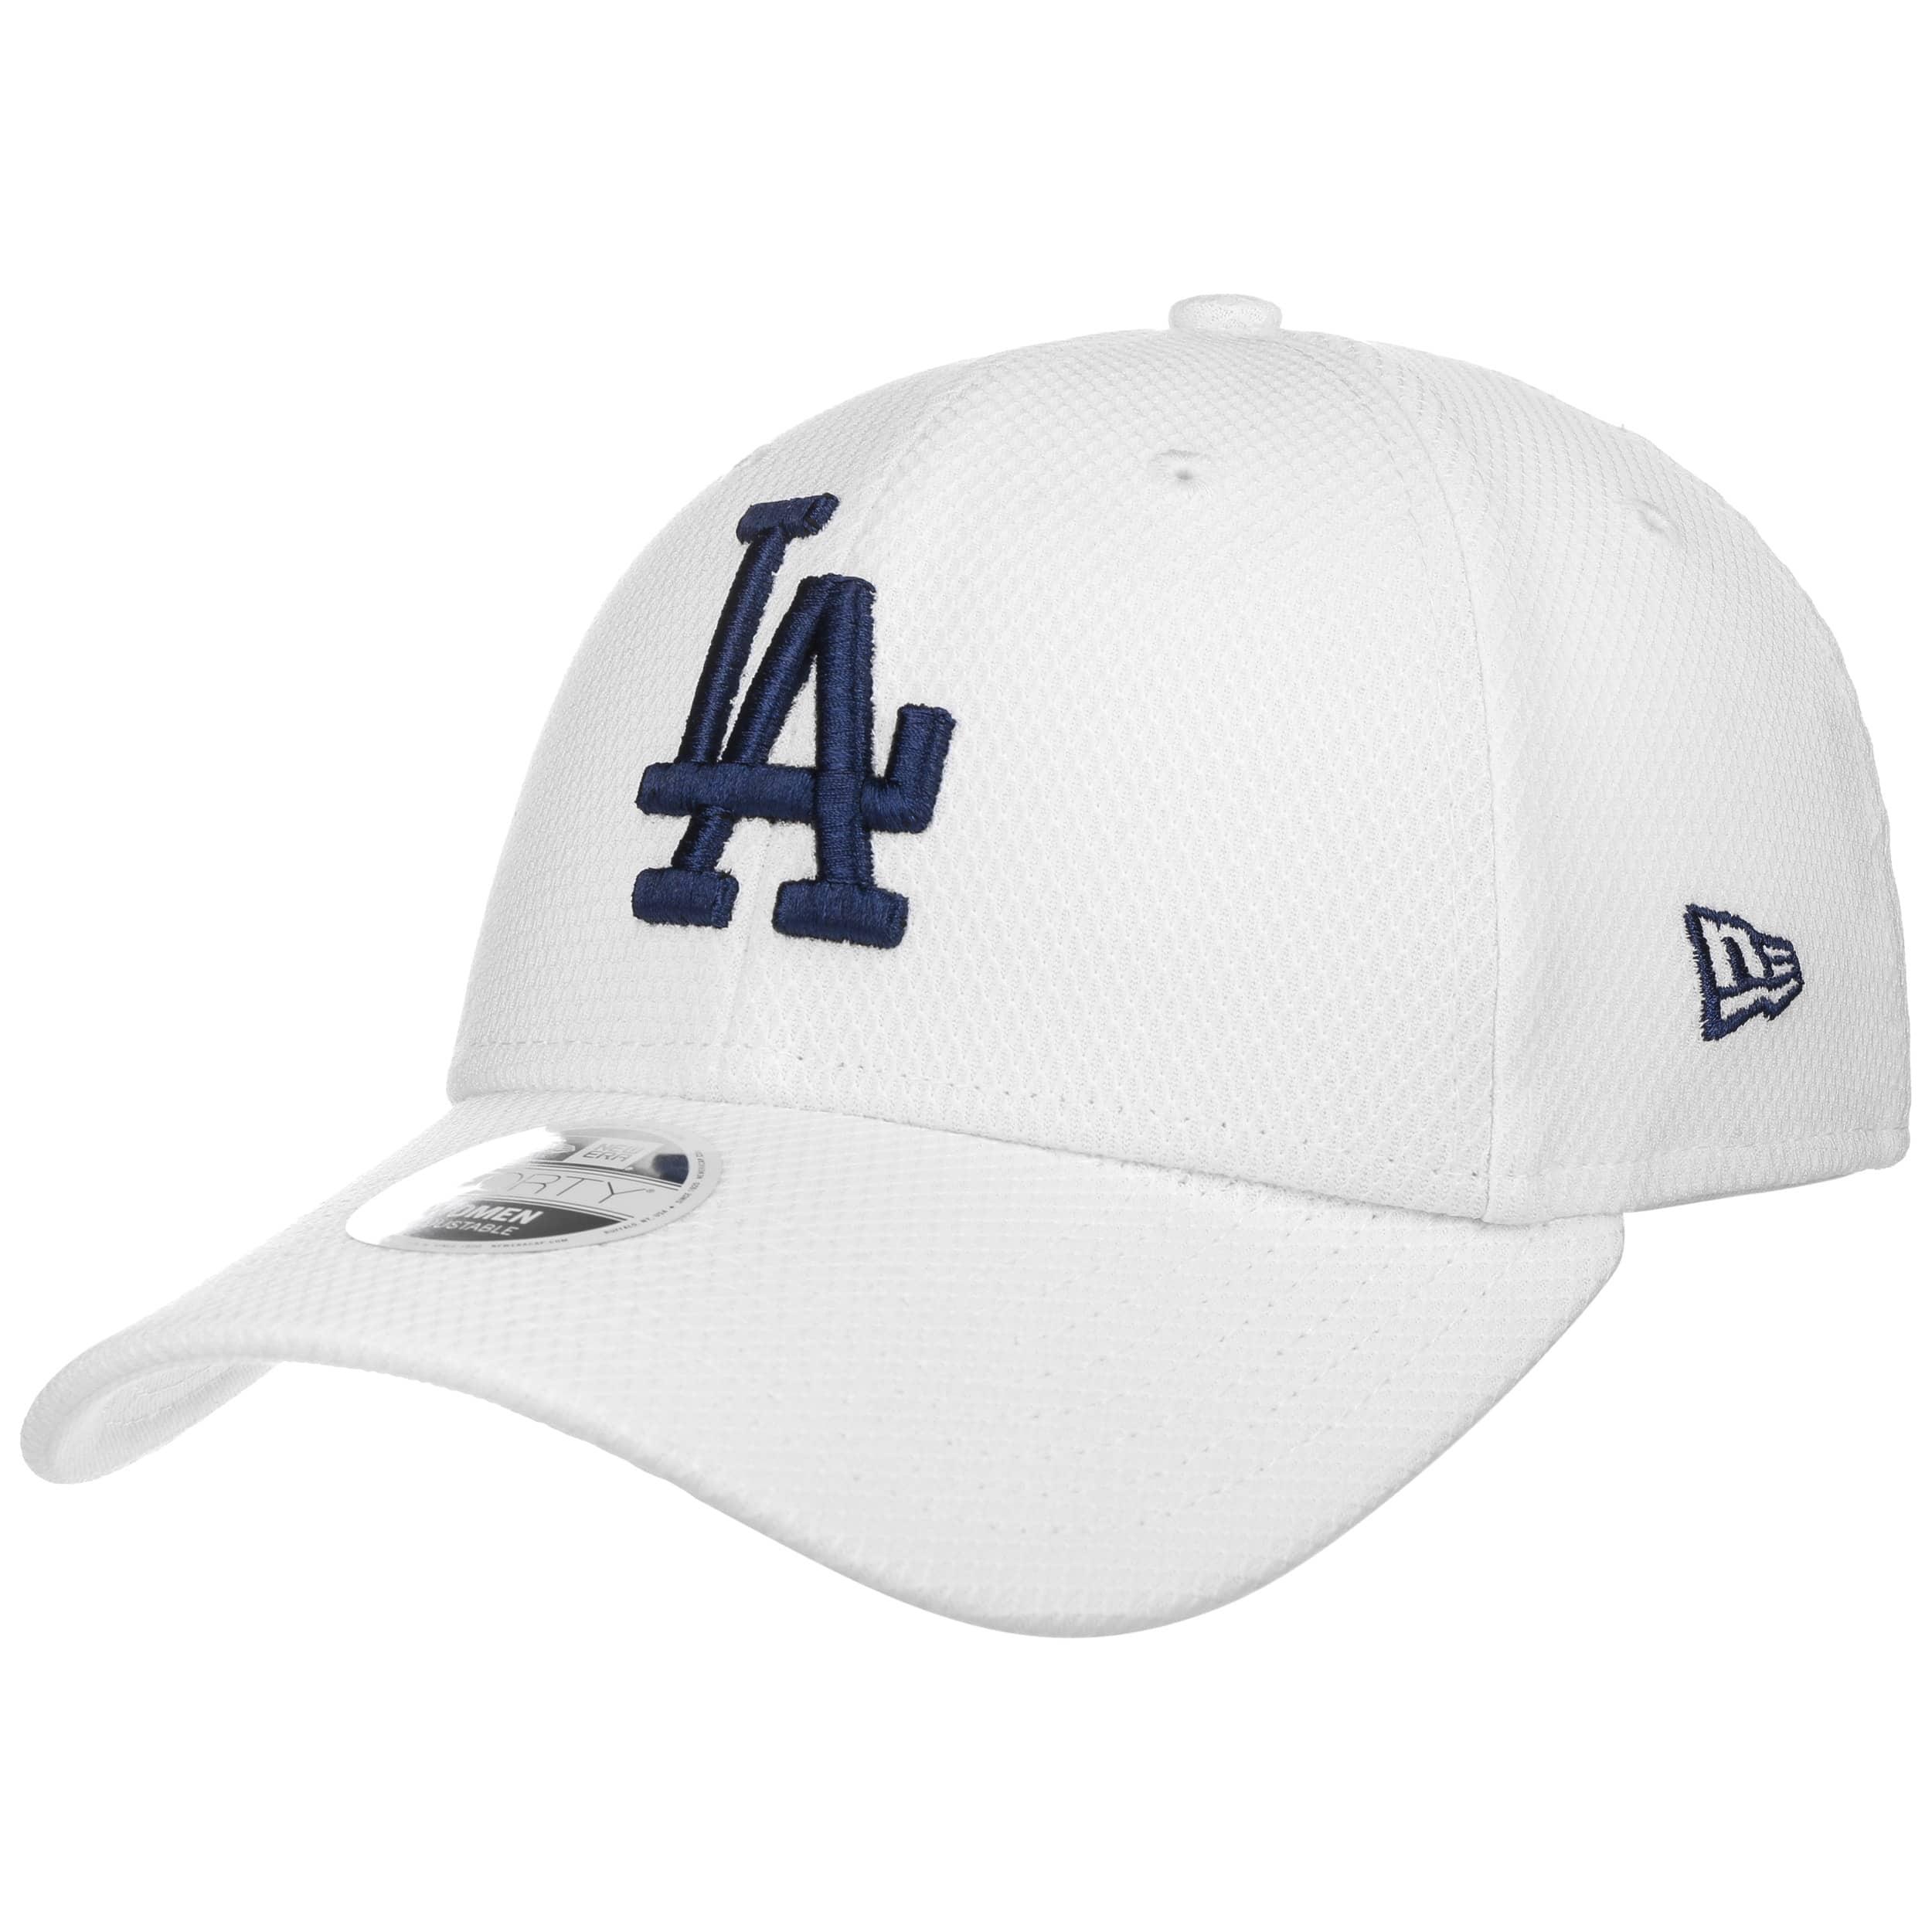 9Forty Women´s Diamond LA Cap by New Era 9f8faaeed